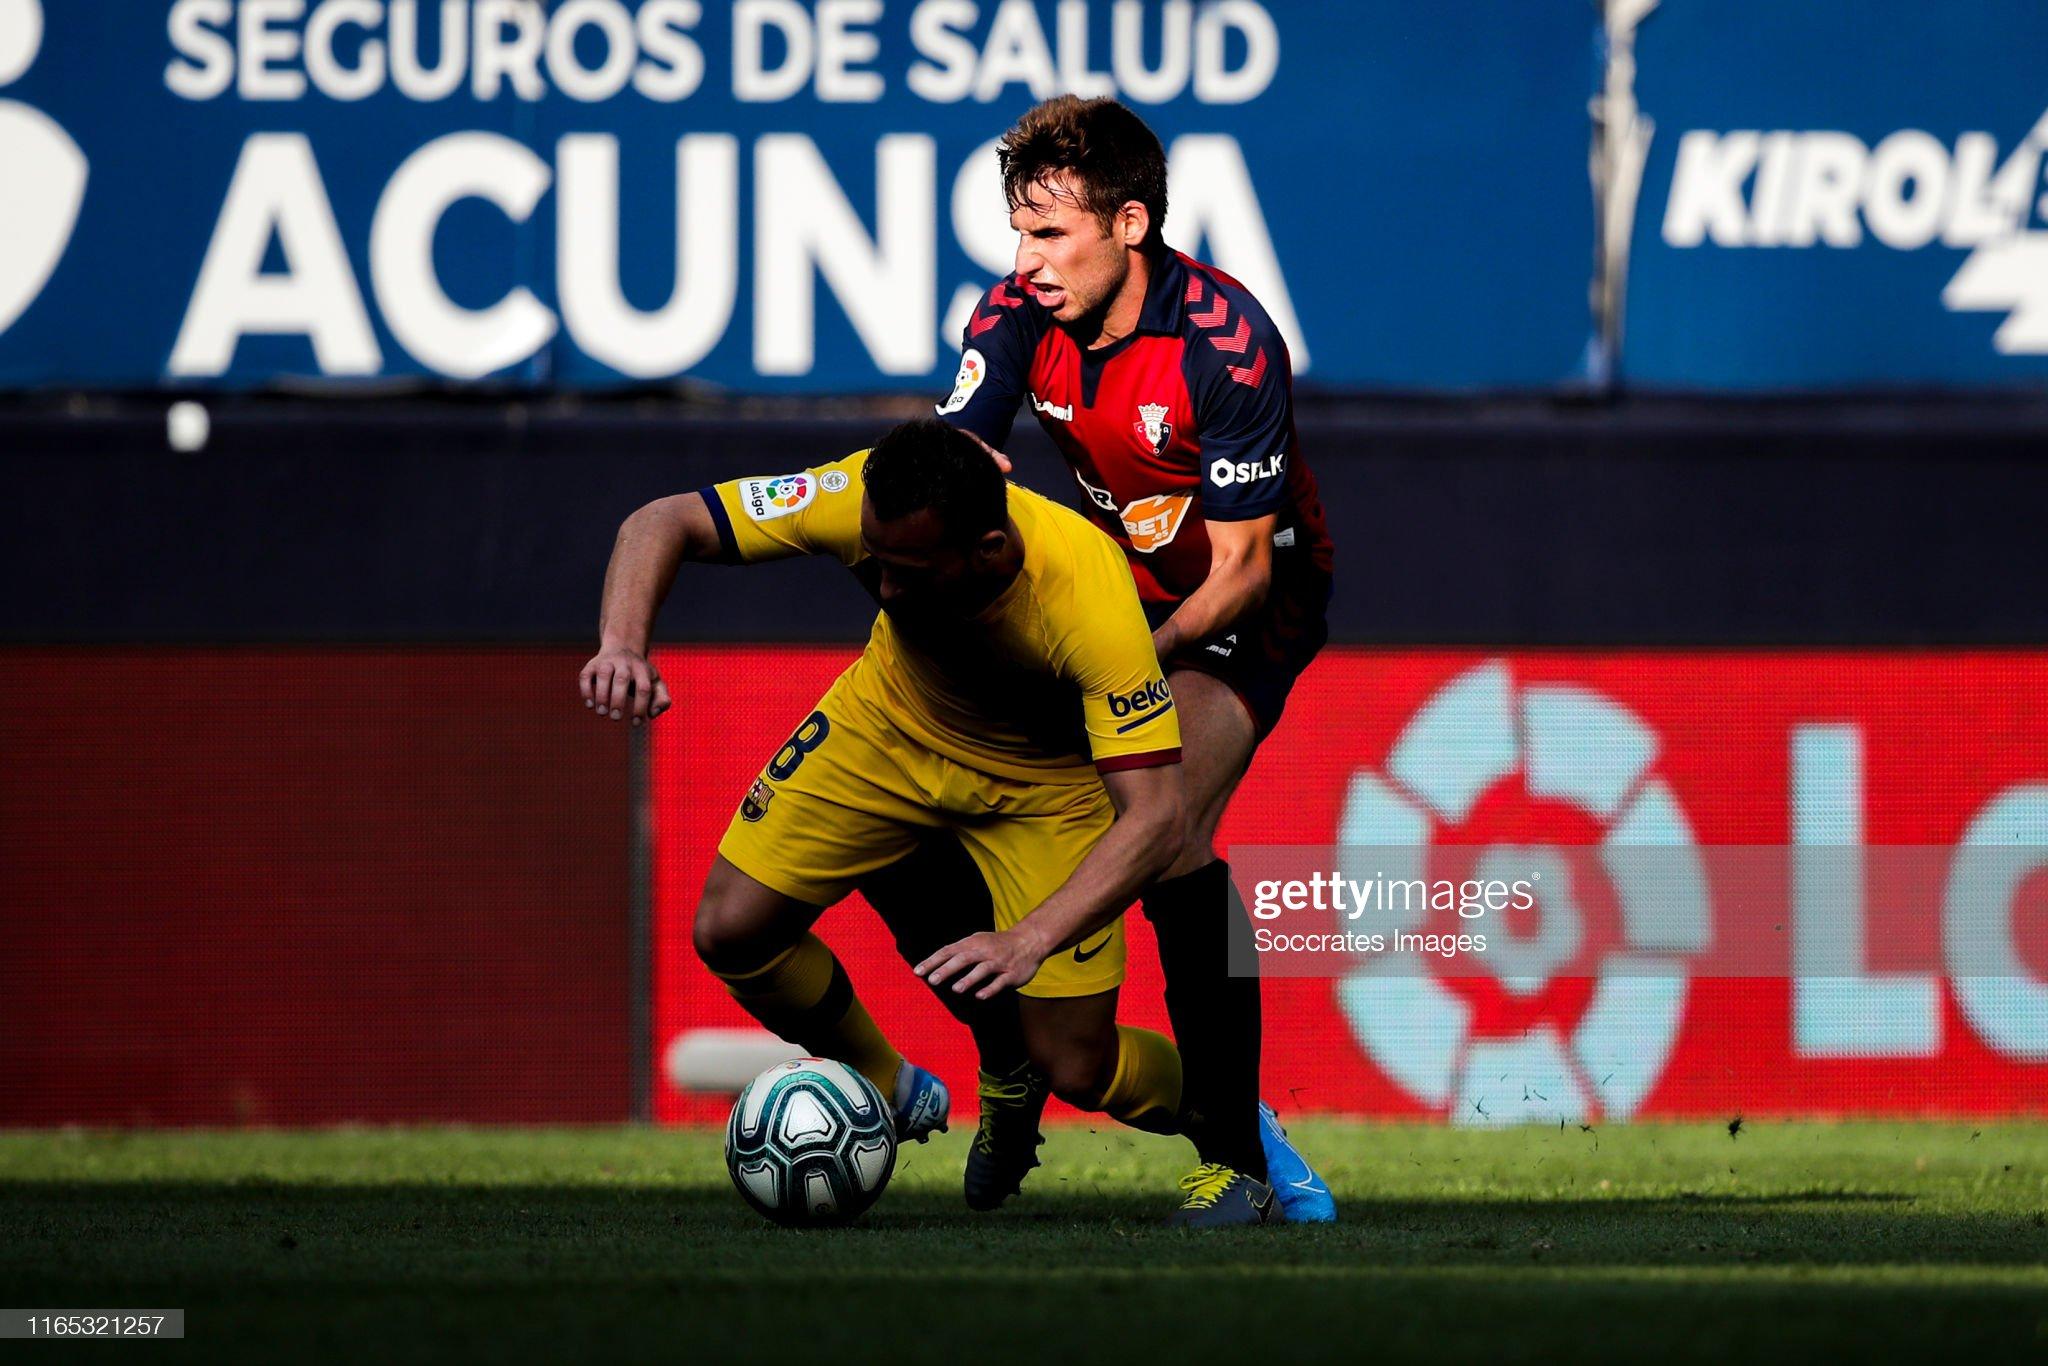 صور مباراة : أوساسونا - برشلونة 2-2 ( 31-08-2019 )  Arthur-of-fc-barcelona-nacho-vidal-of-ca-osasuna-during-the-la-liga-picture-id1165321257?s=2048x2048